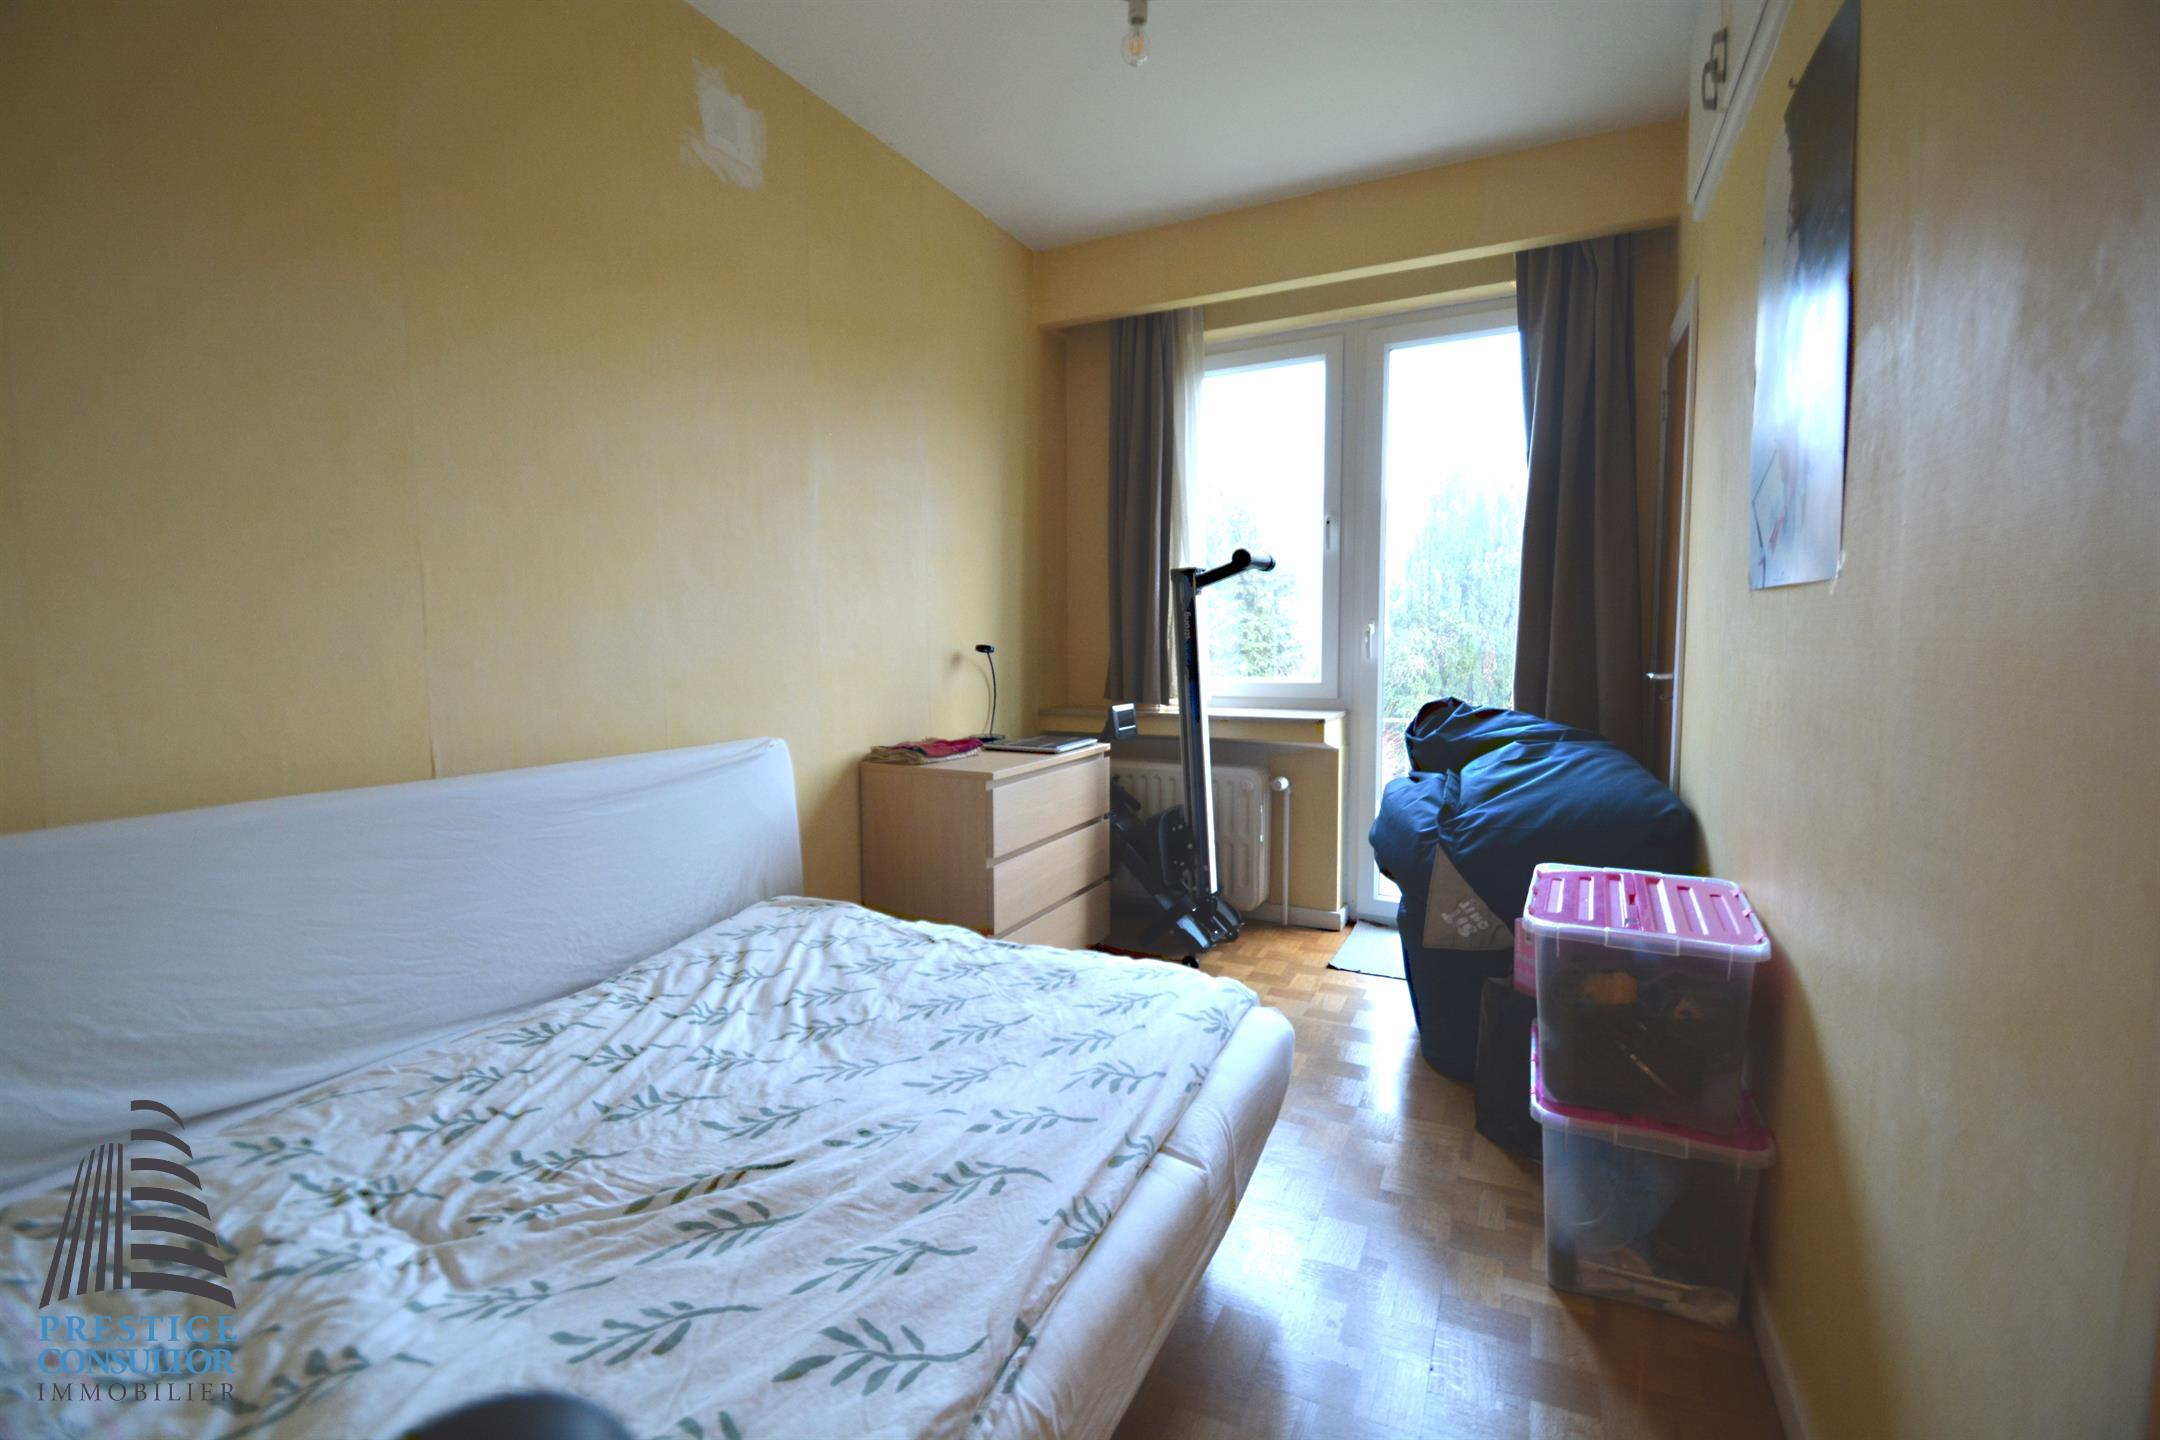 Appartement - Woluwe-Saint-Lambert - #3960211-7